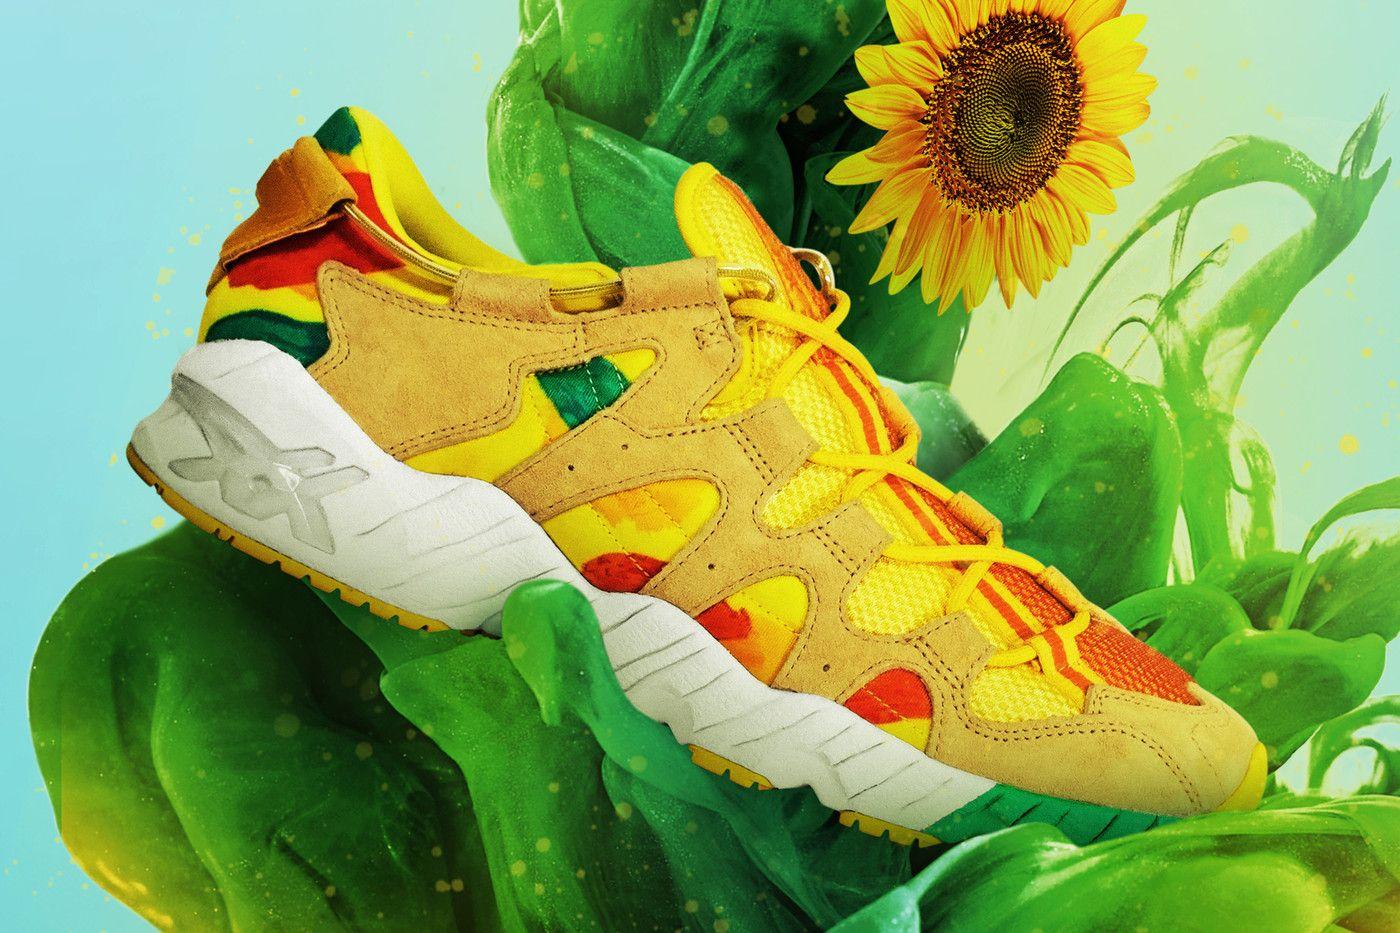 ko100_ASICS 全新「KO100」週年限量系列正式登場   Saucony sneaker, Running shoes